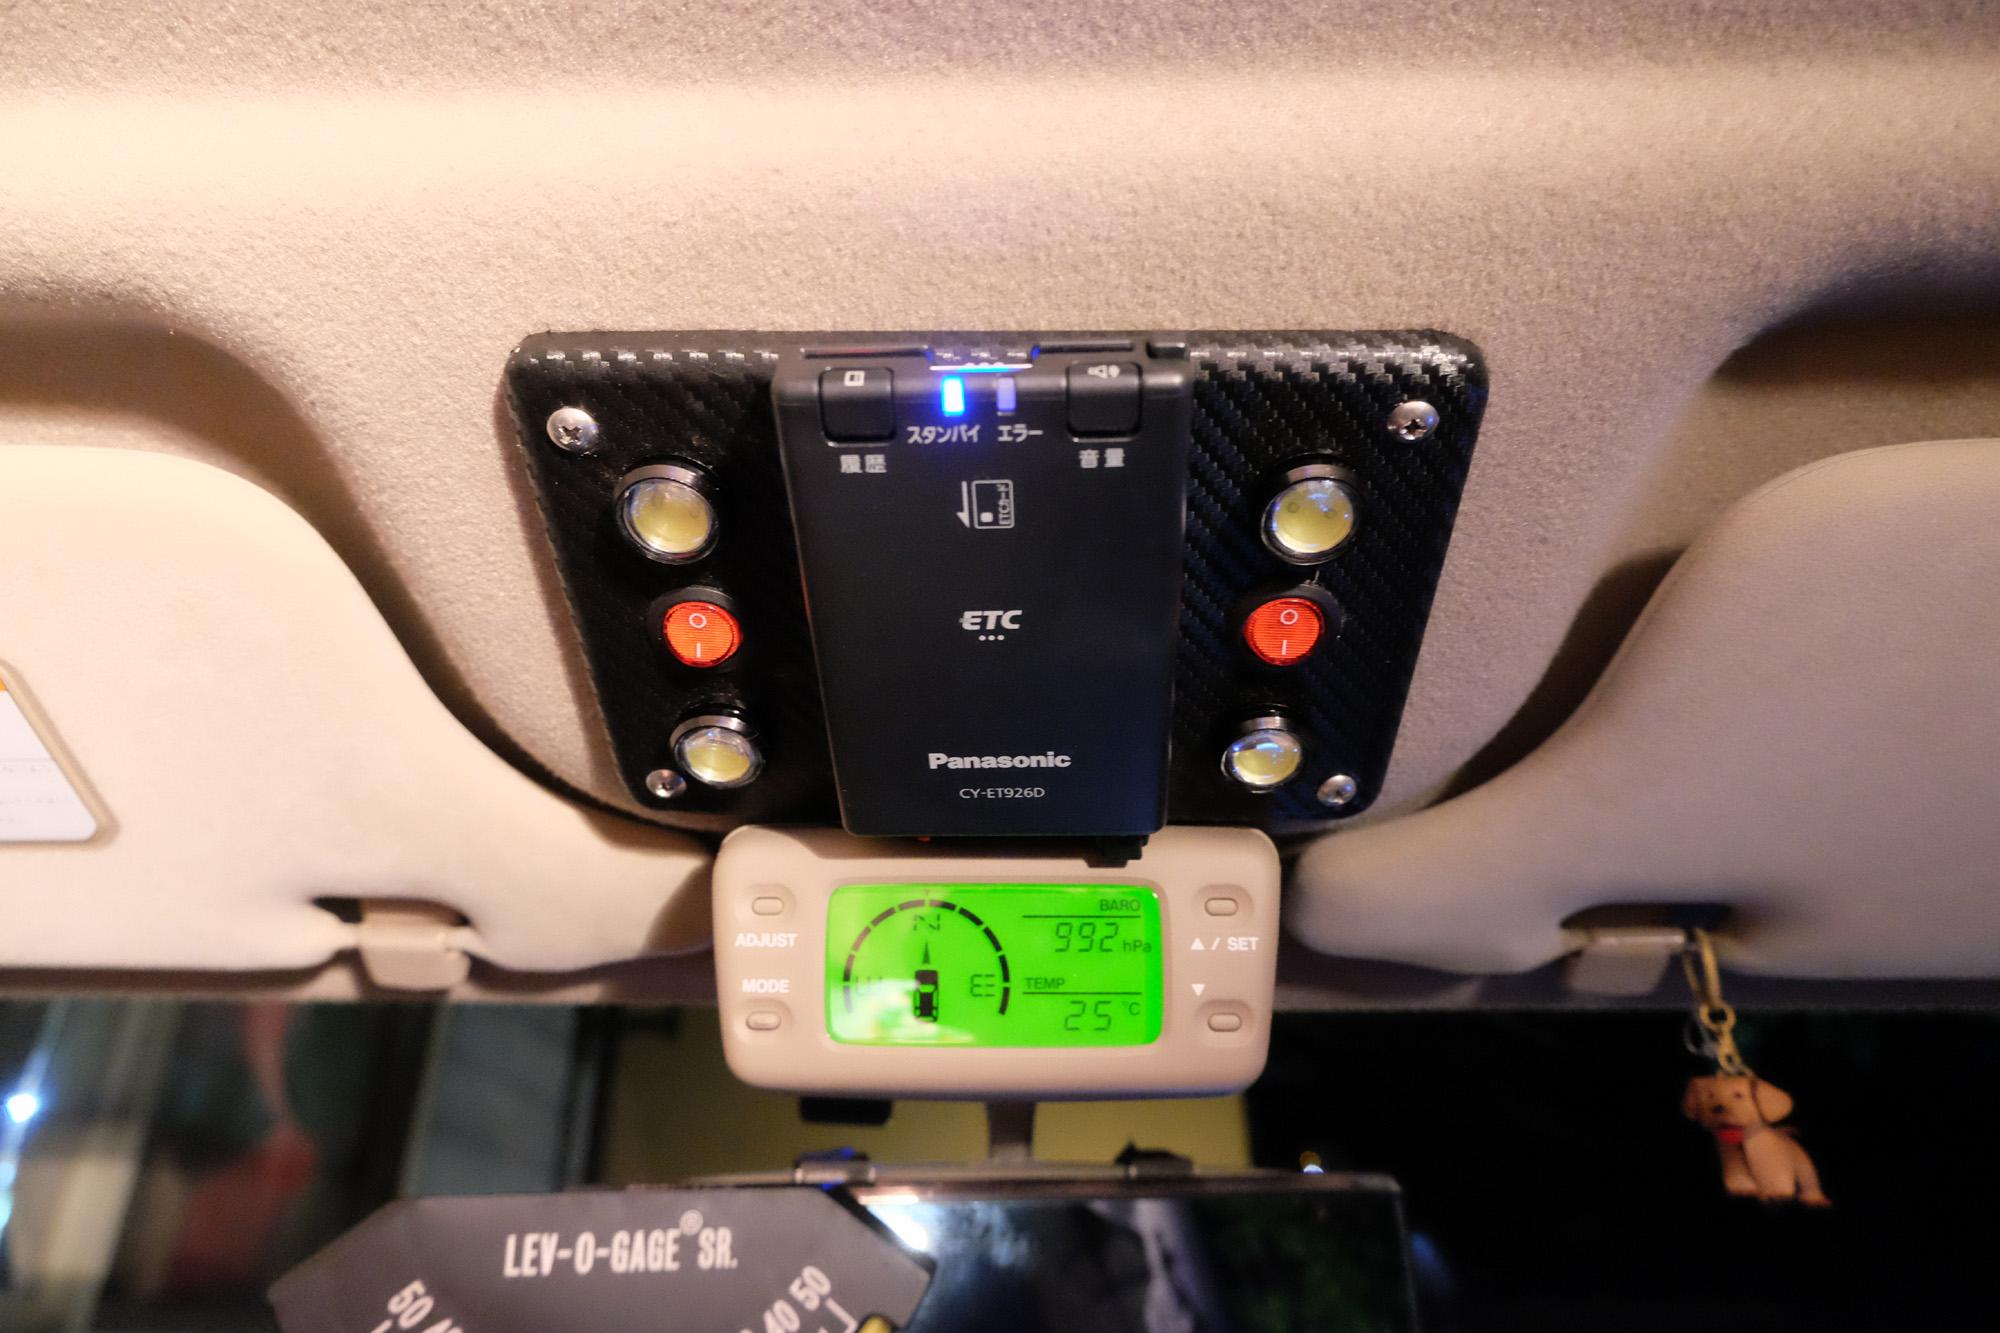 ETC Panasonic CY-ET926D やっとDIY取付です。 isuzu ビッグホーン UBS26GW